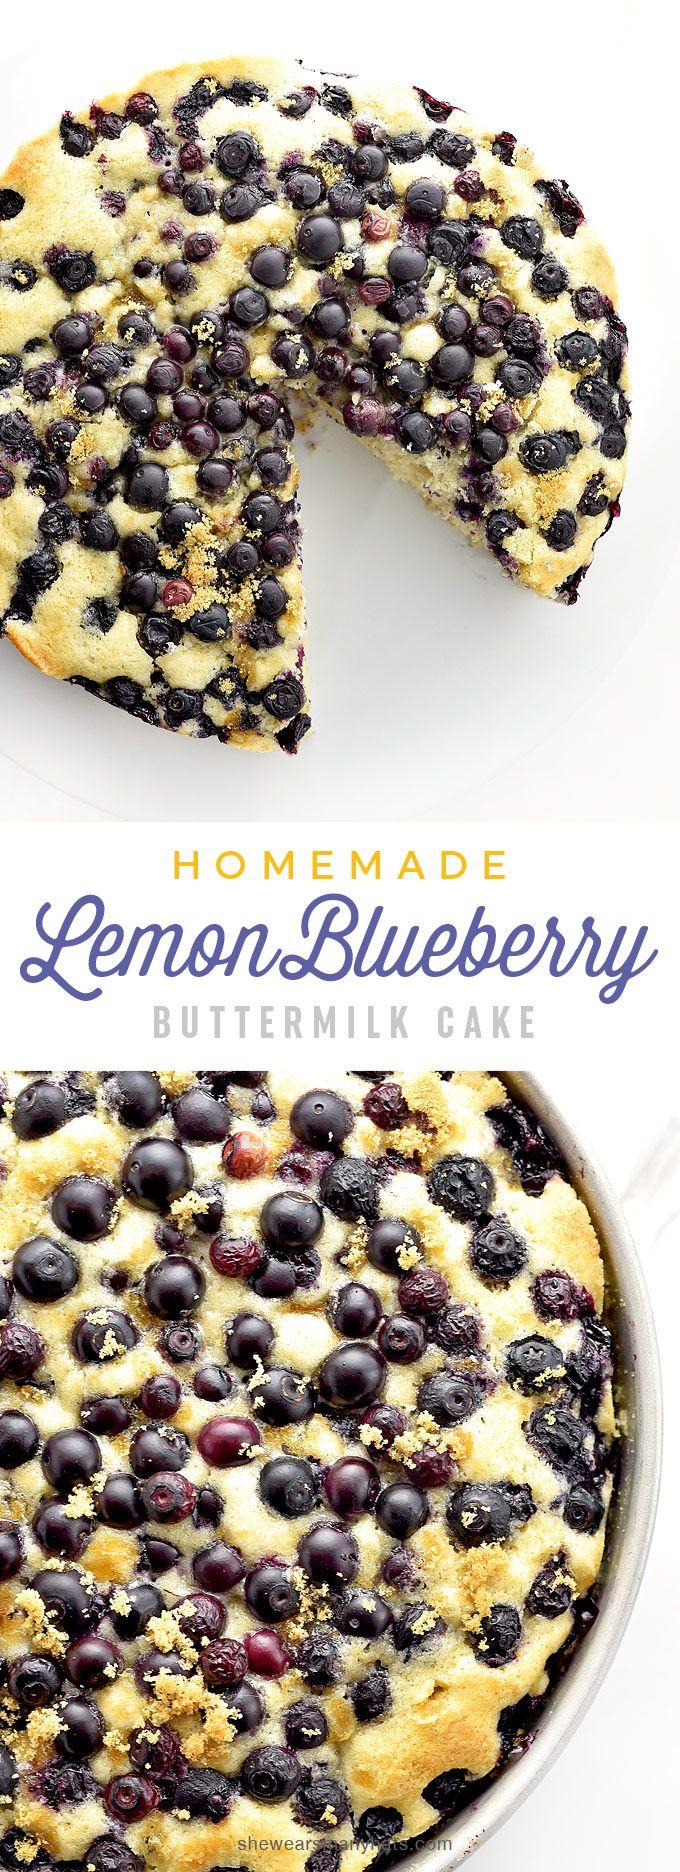 Homemade Lemon Blueberry Buttermilk Cake Recipe   shewearsmanyhats.com